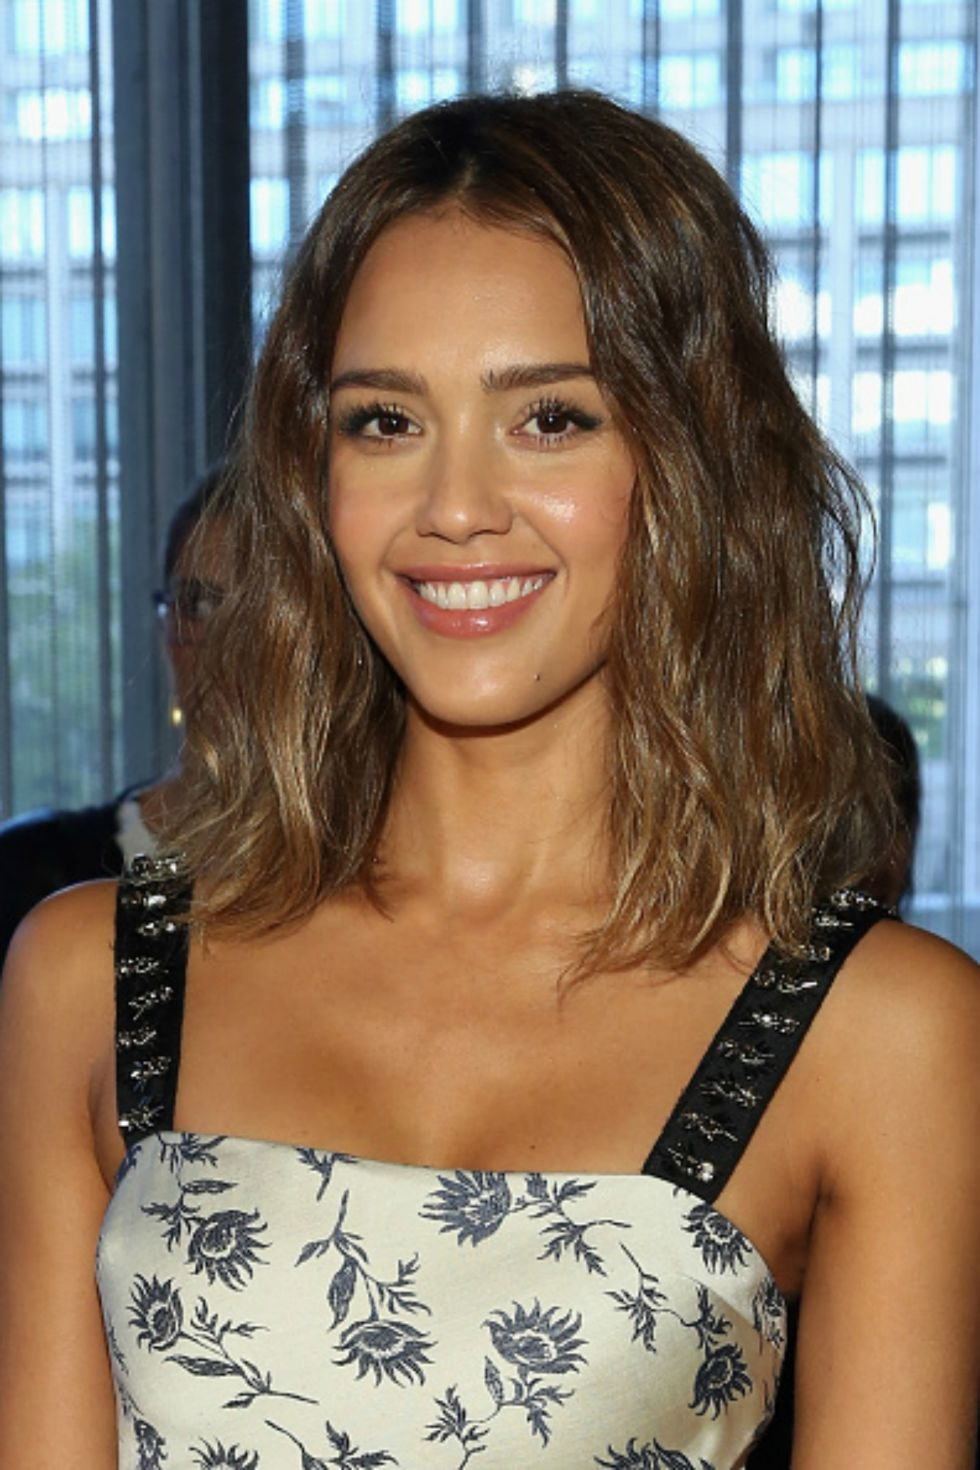 Fashion hairstyles 2015 - Fashion Hairstyles 2015 20